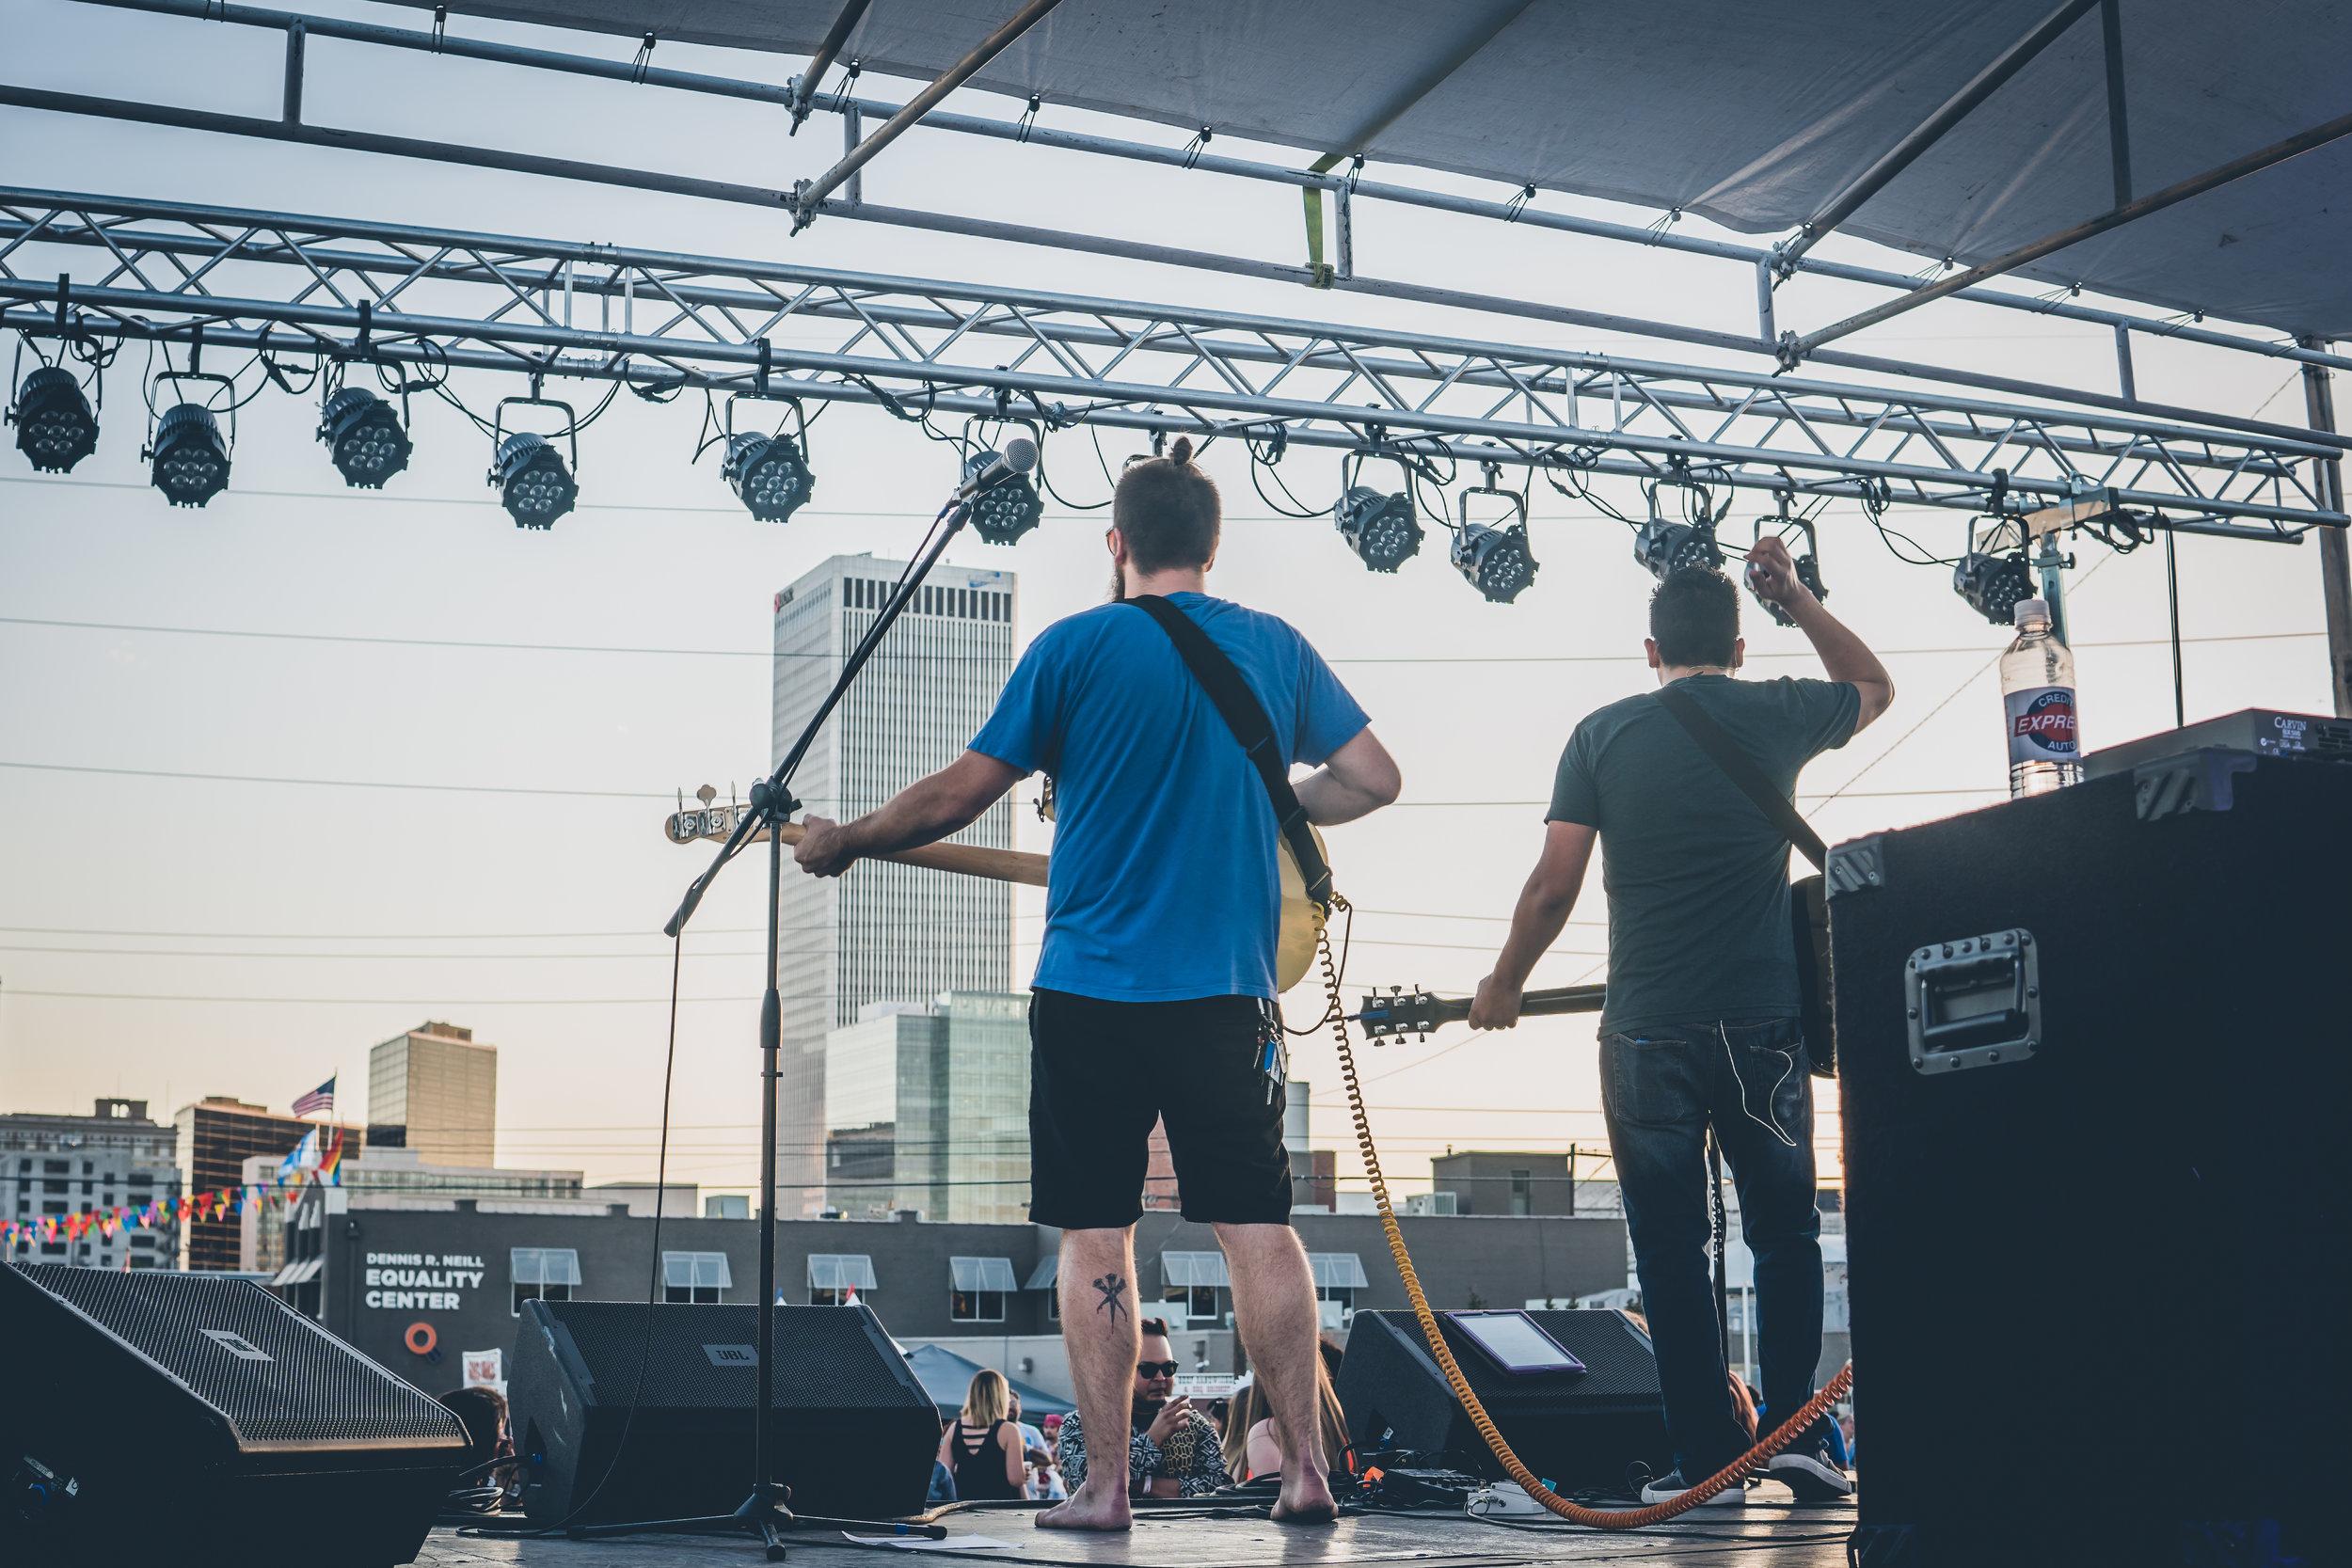 FM Pilots - Tulsa Rock Band - Tulsa Pride Fest Tulsa, OK 060416-12.jpg